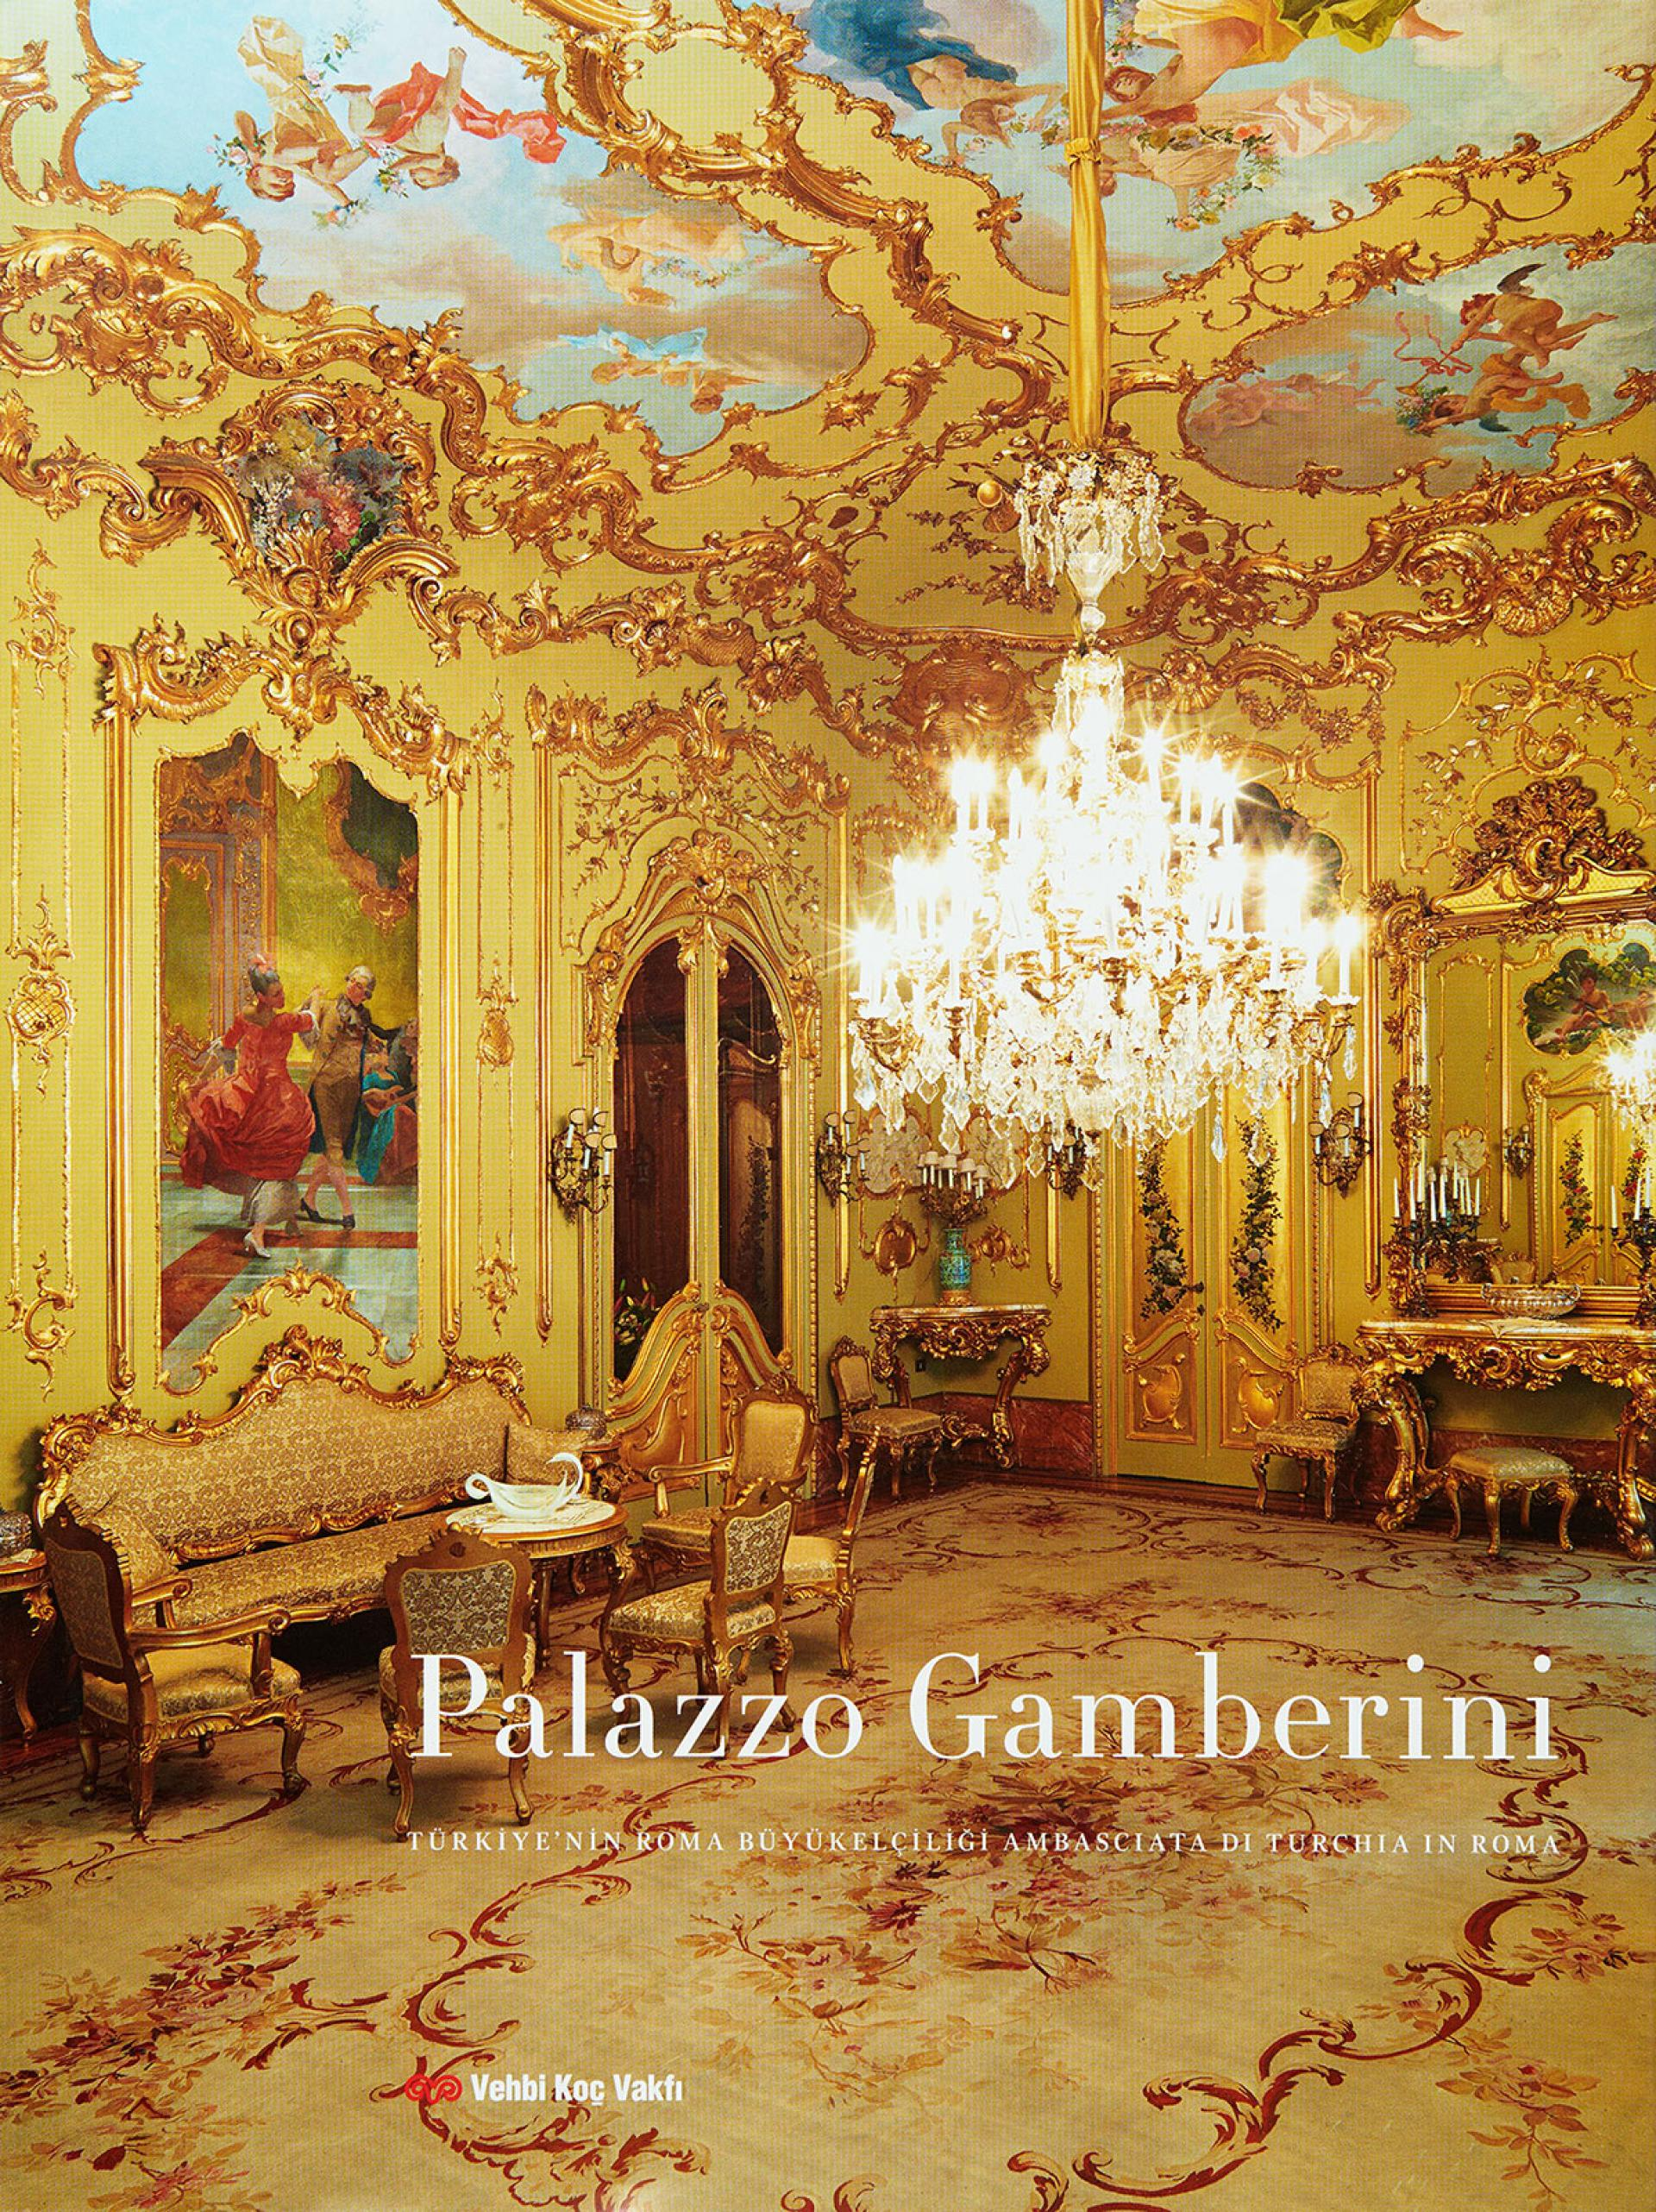 Palazzo Gamberini - Ambasciata di Turchia in Roma - BOOKS - Sadberk Hanım Museum